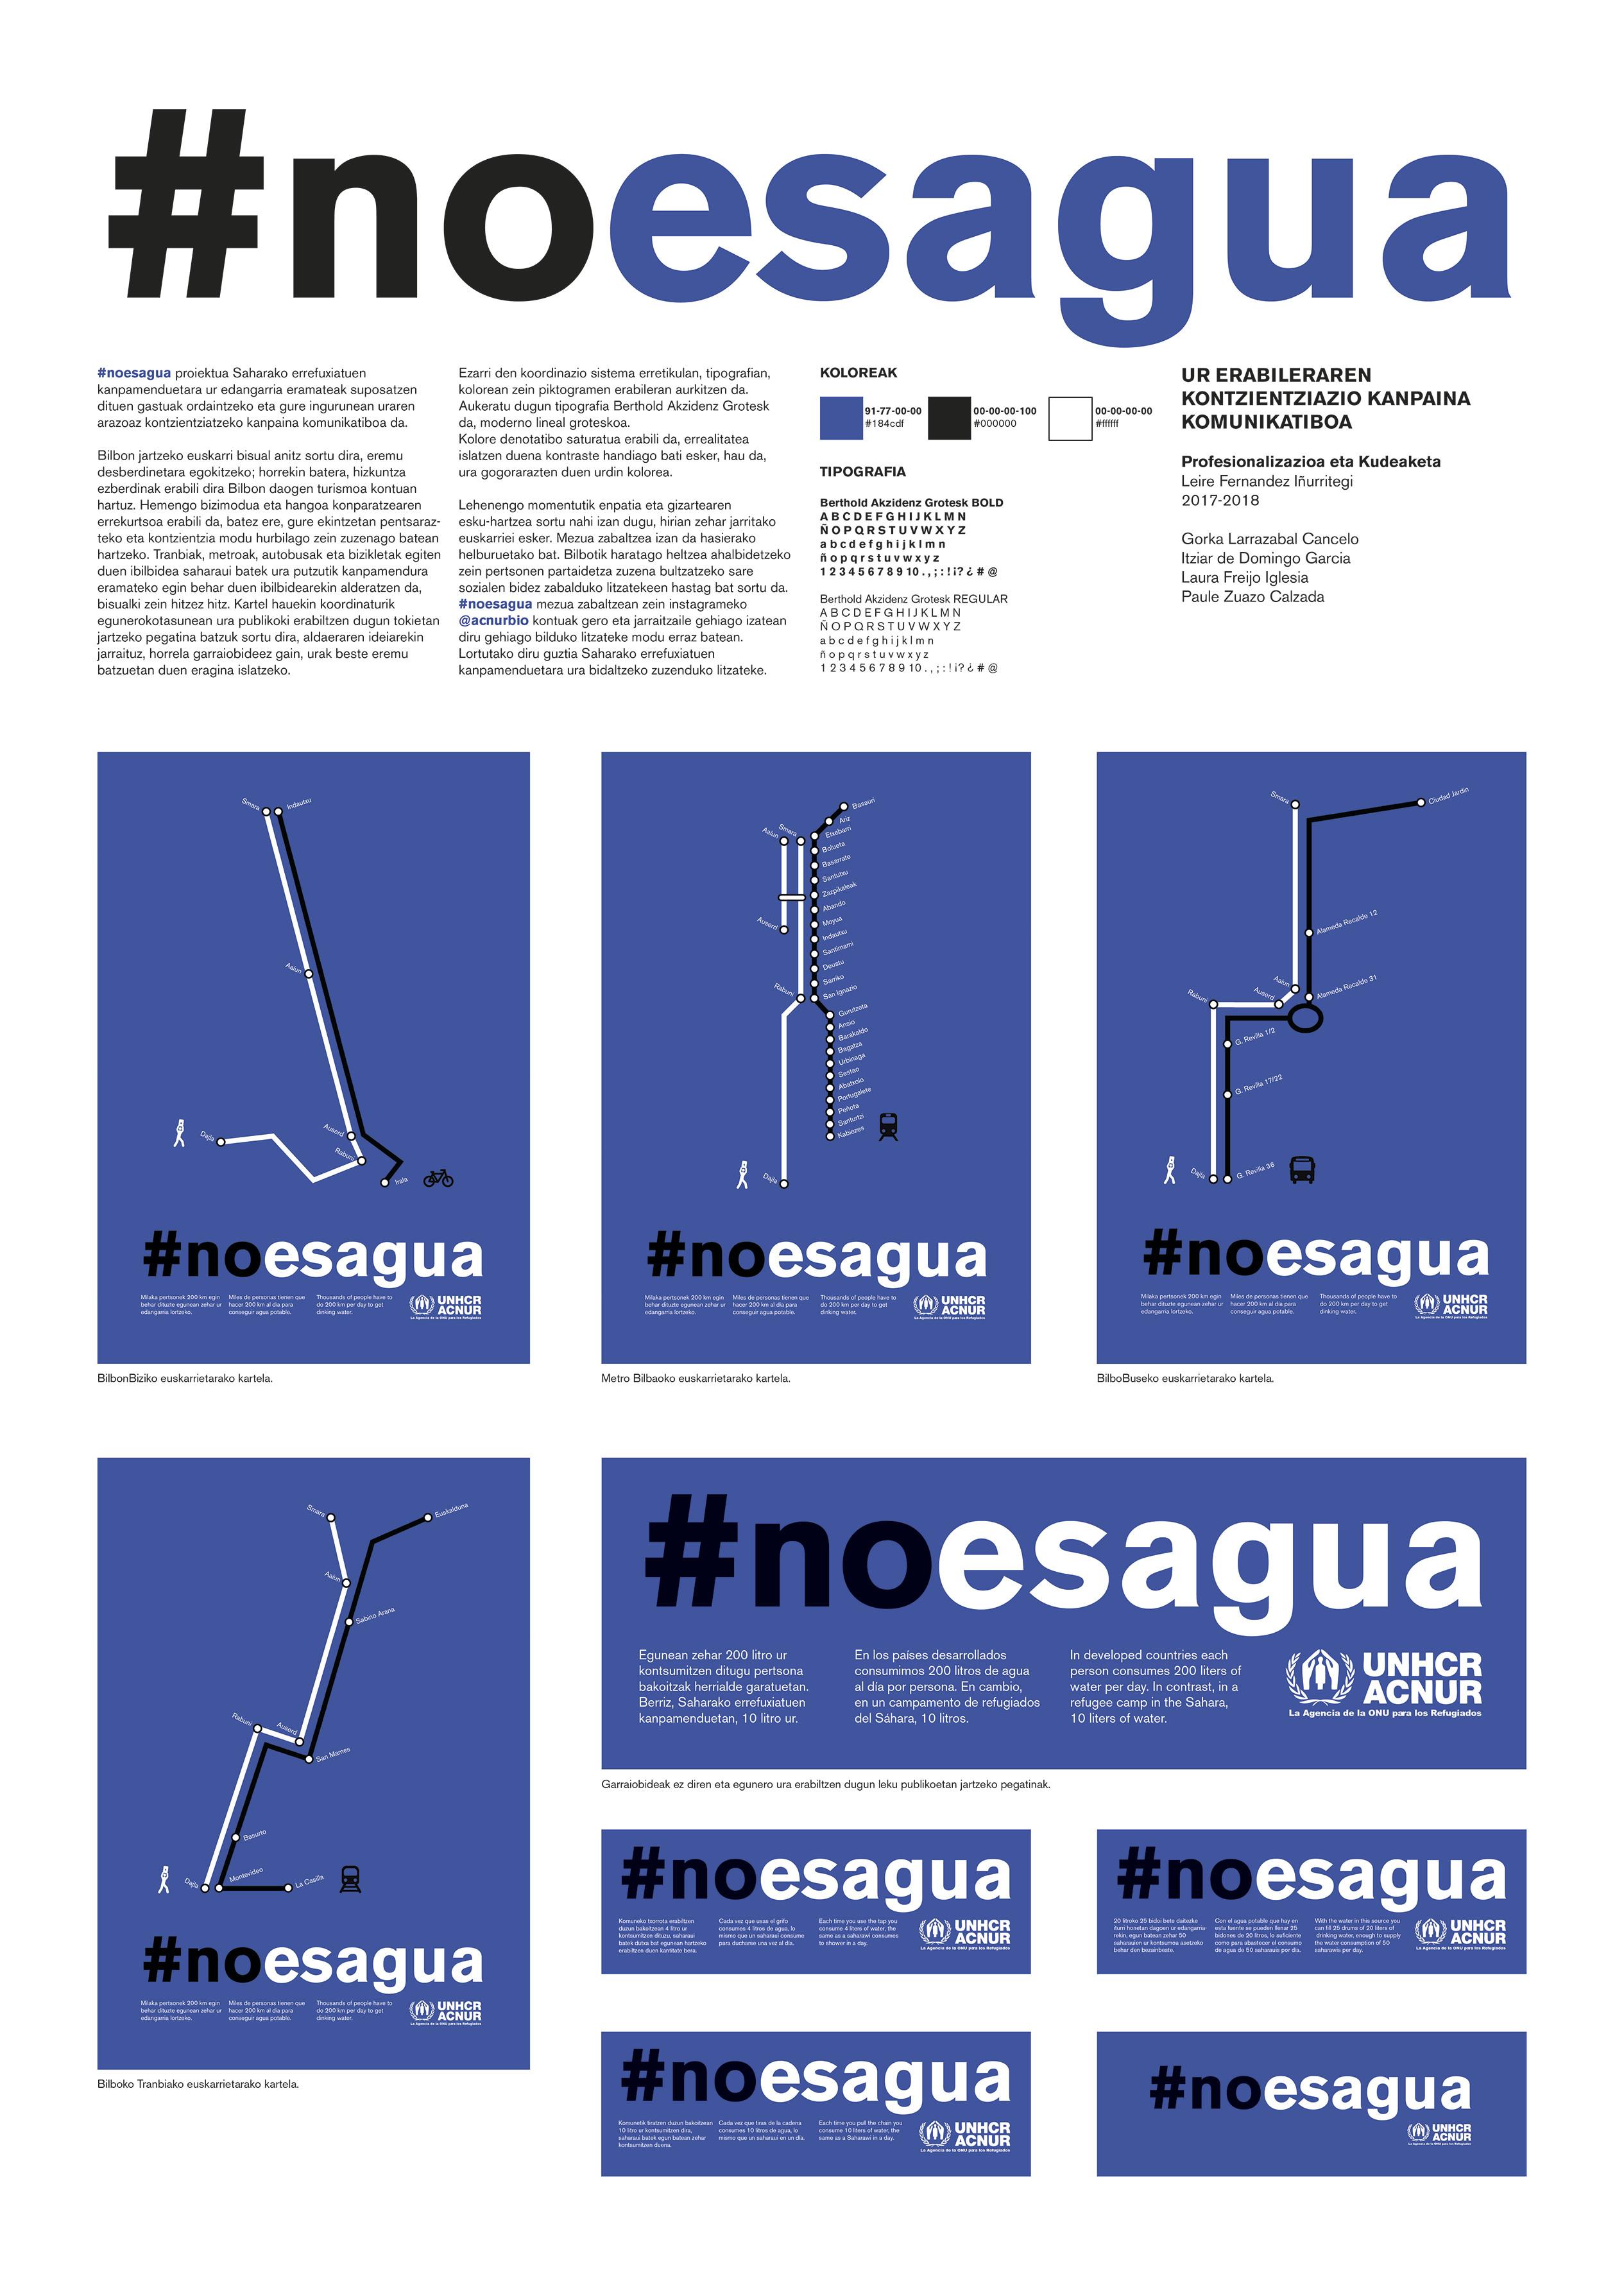 #noesagua by PigDesign - Creative Work